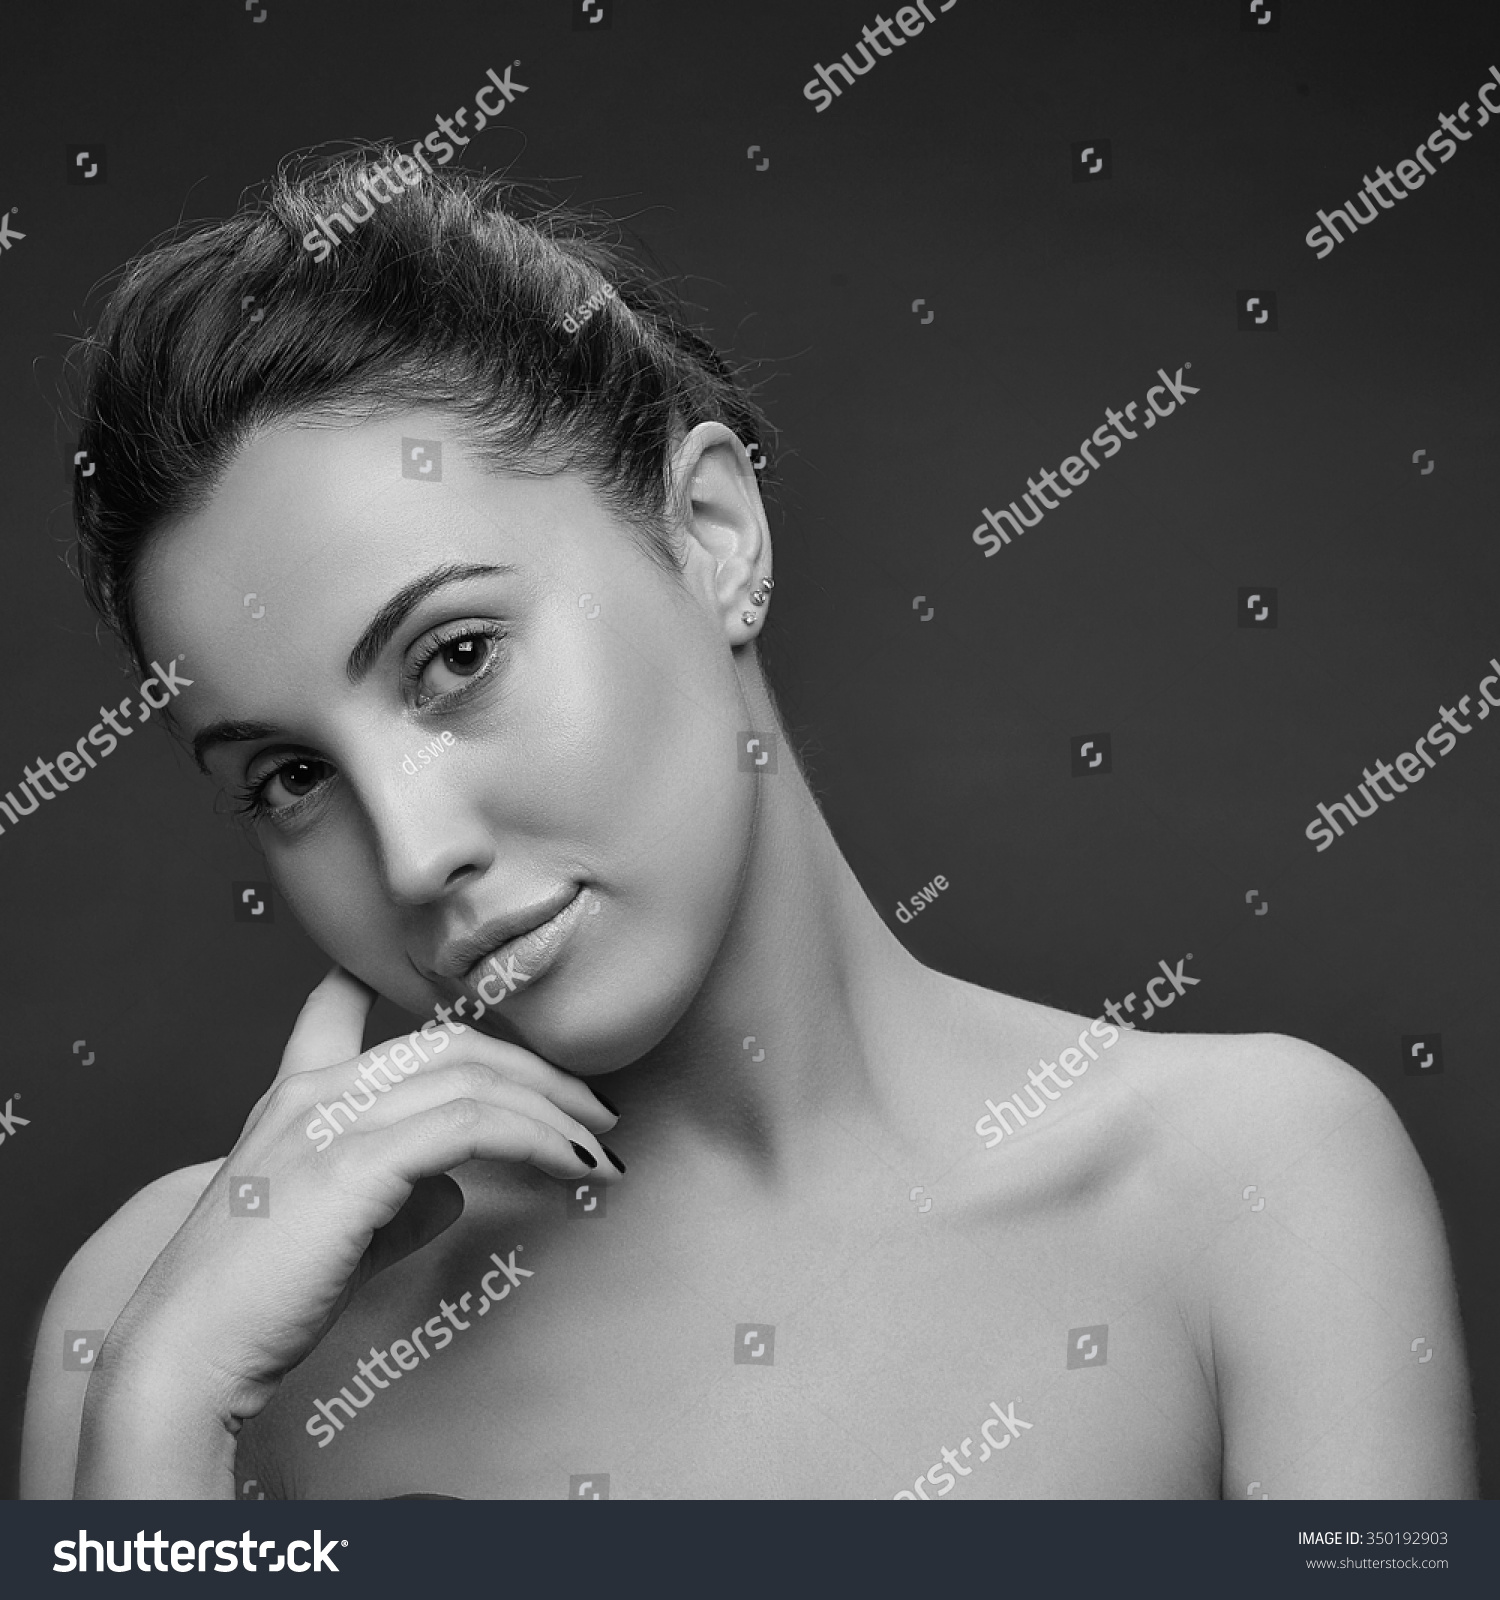 Girl sex same sex nude